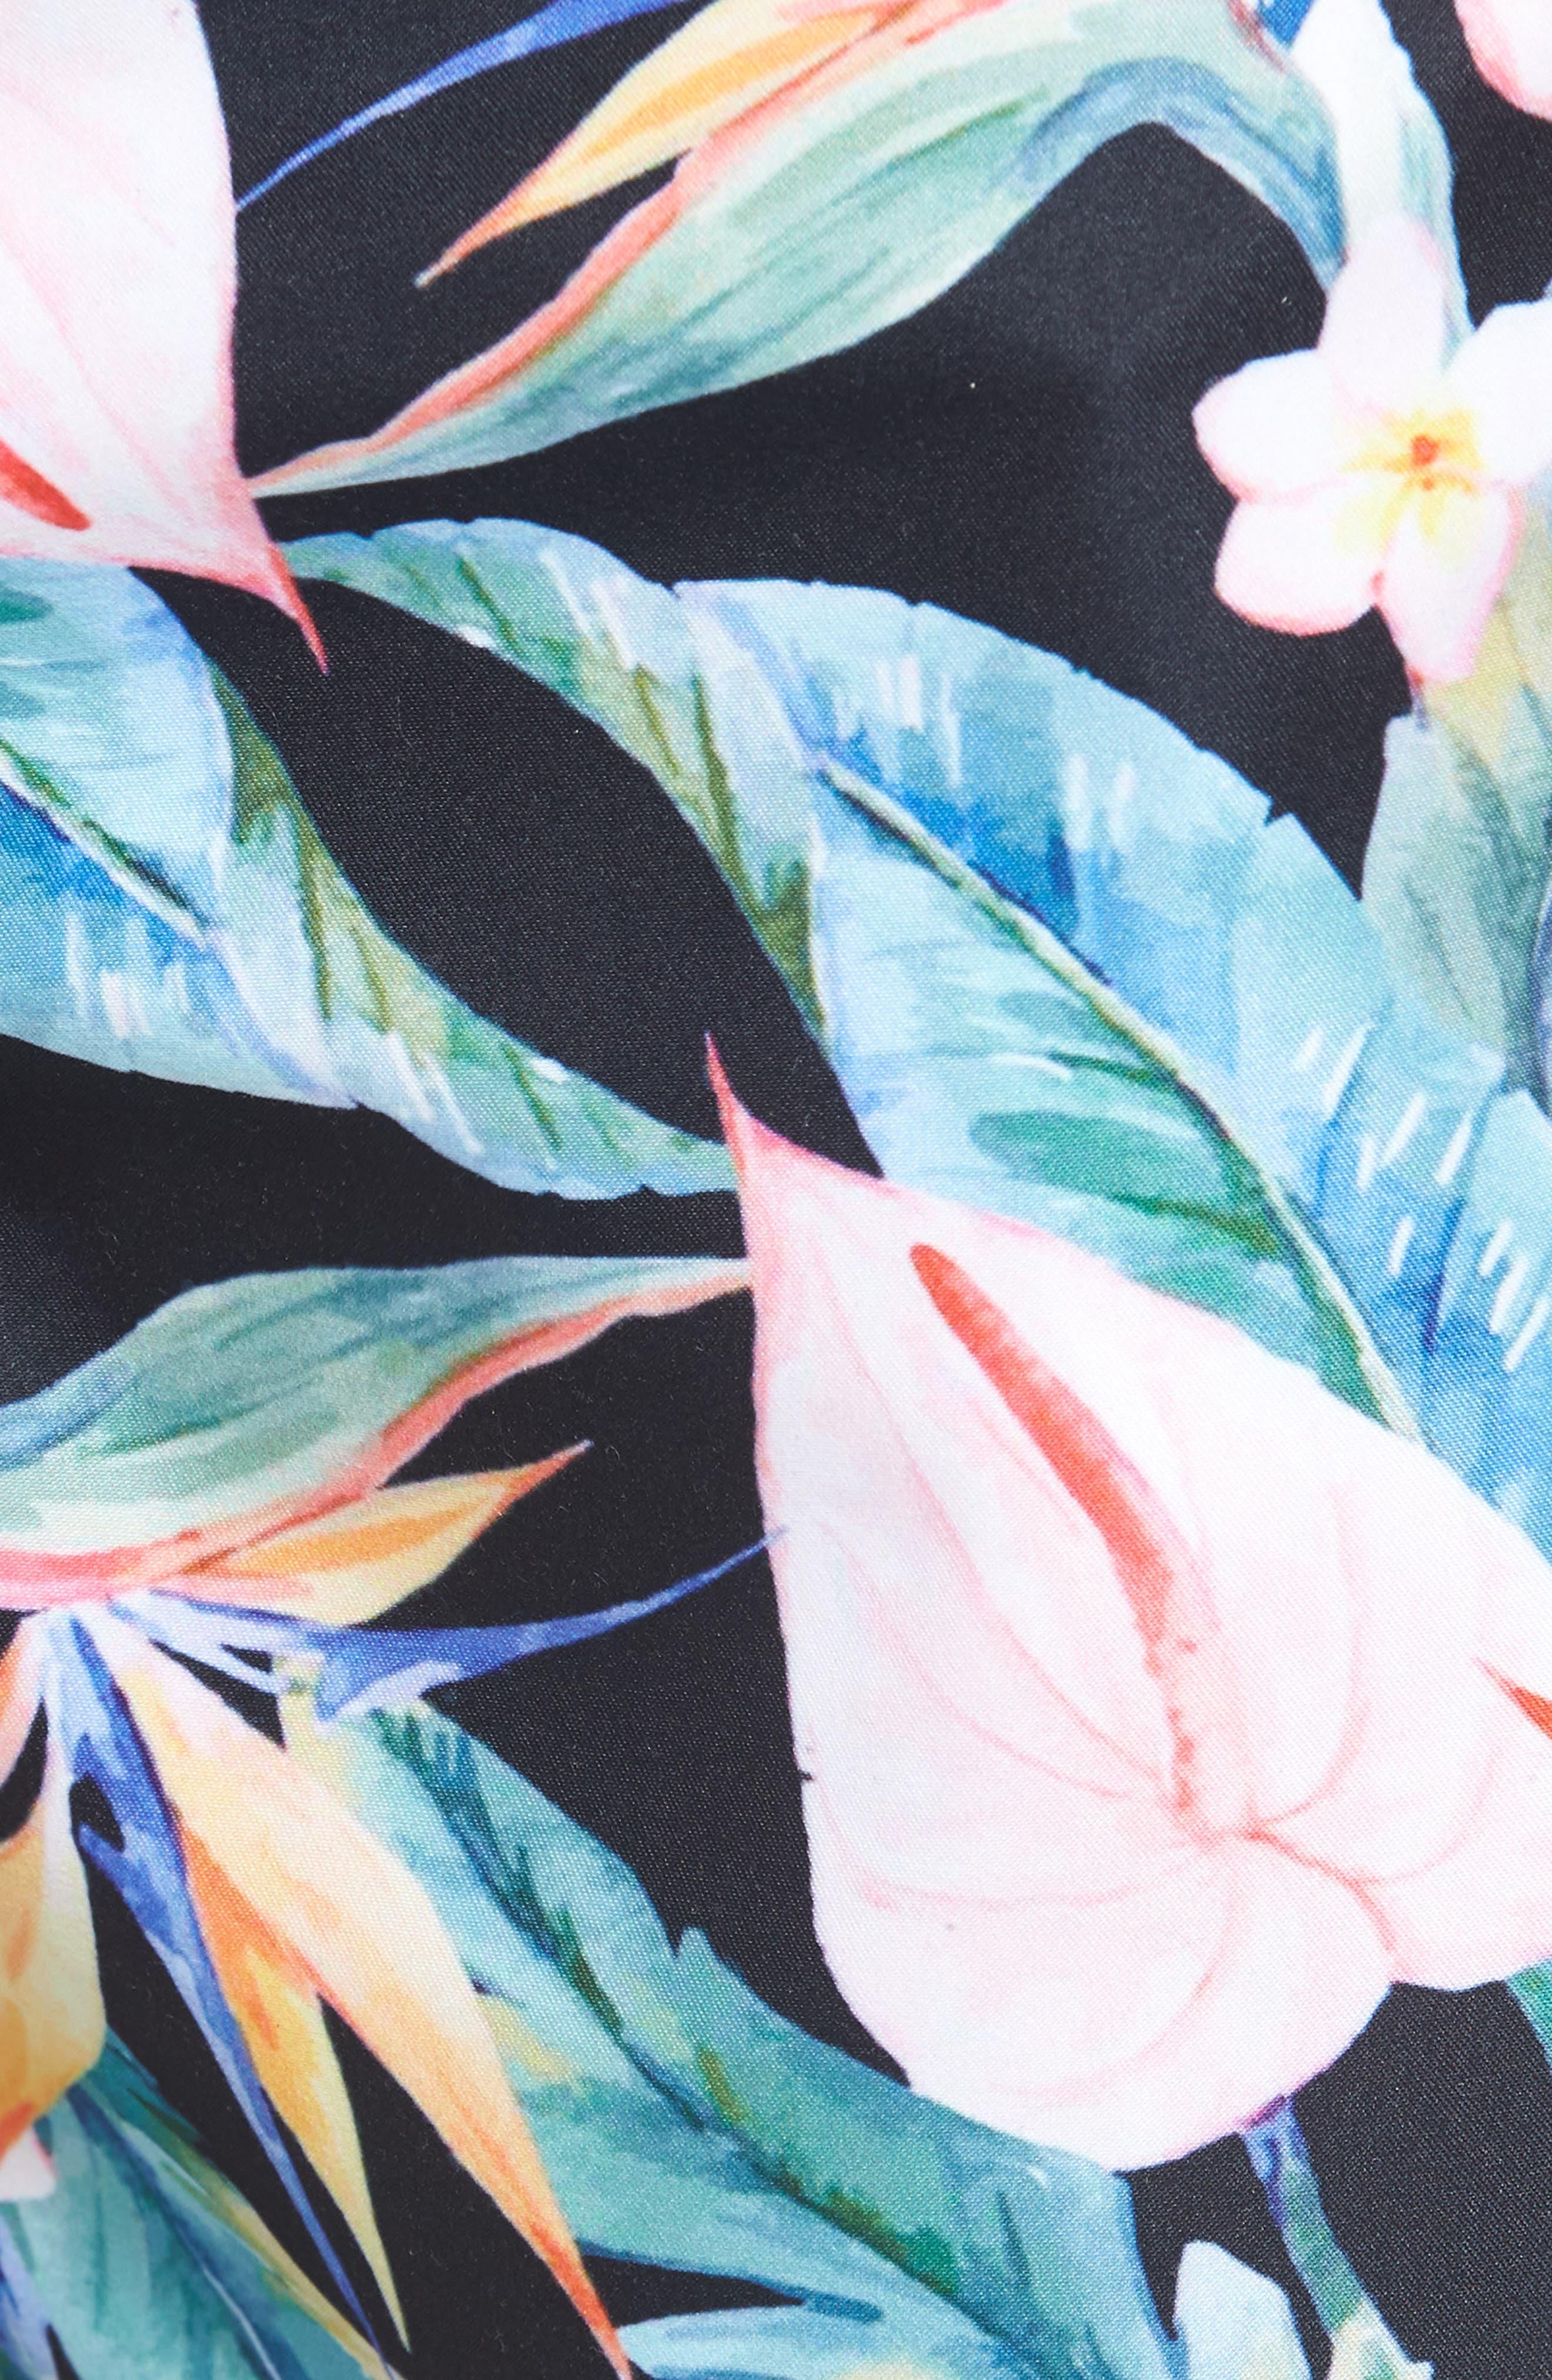 Floral Print Swim Trunks,                             Alternate thumbnail 5, color,                             Multi